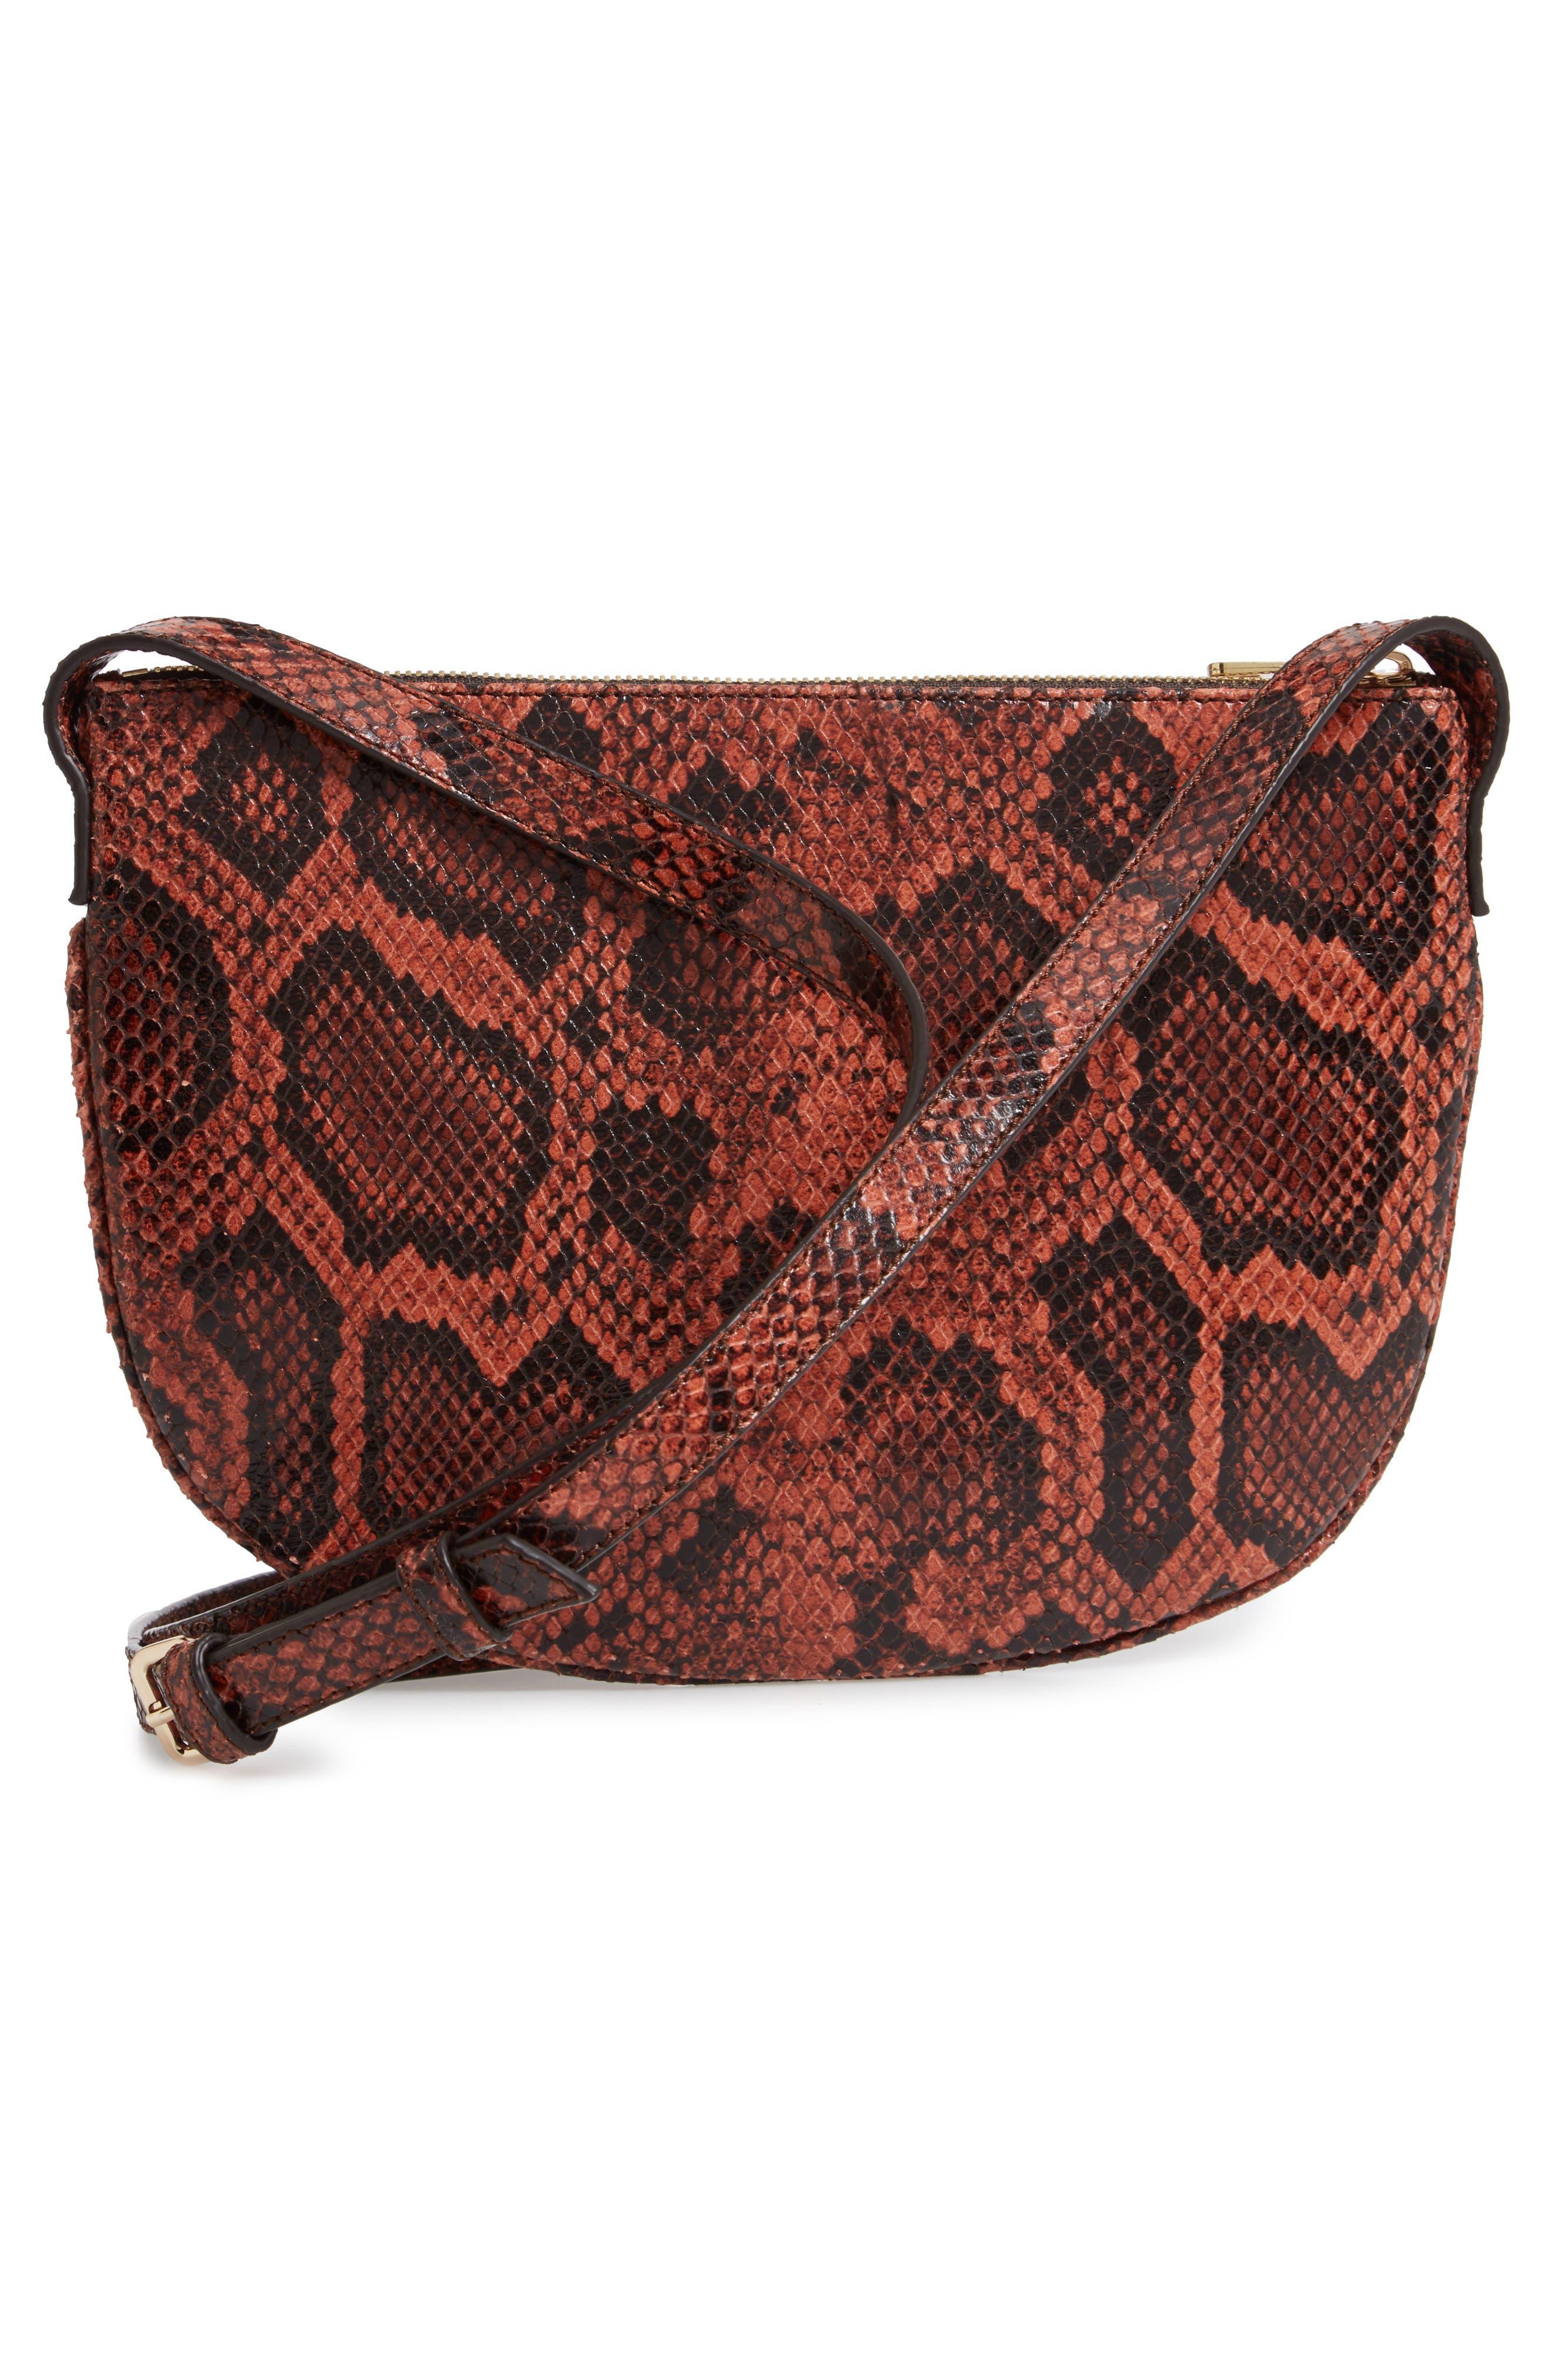 A.P.C., Sac Maelys Python Embossed Leather Crossbody Bag, Alternate thumbnail 4, color, EAF BRIQUE